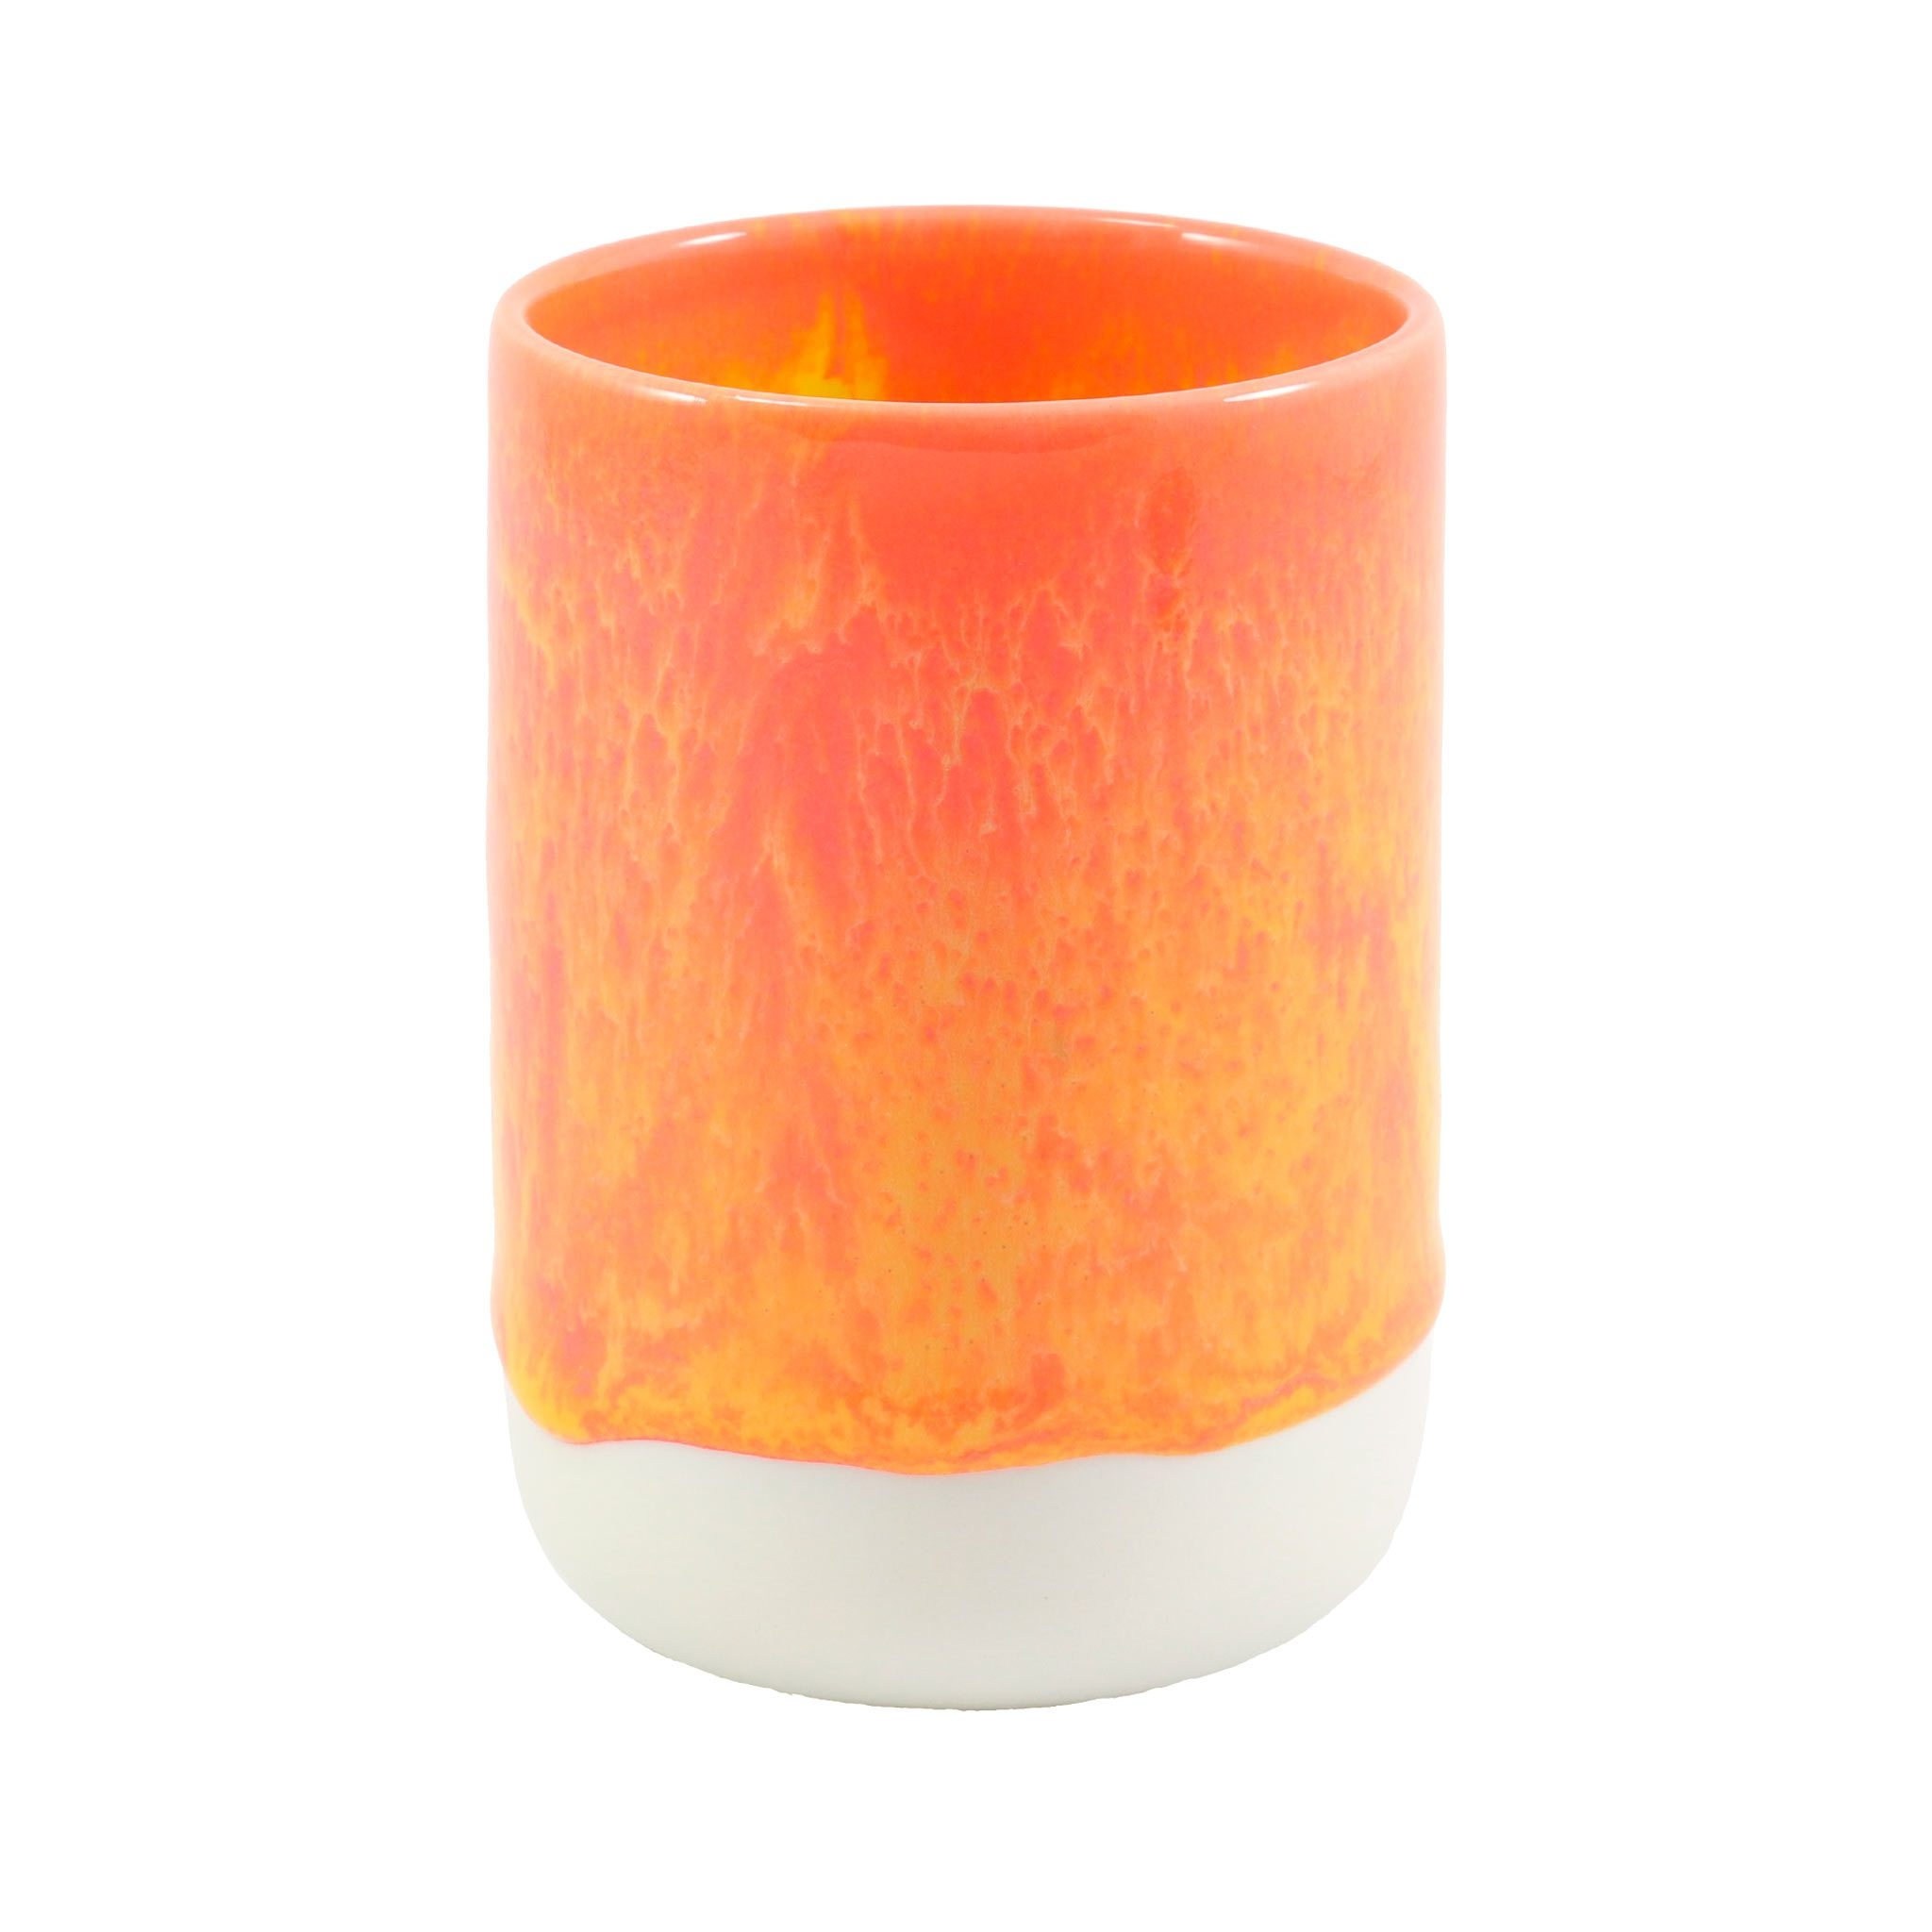 Studio Arhoj Slurp Cup Tropicana